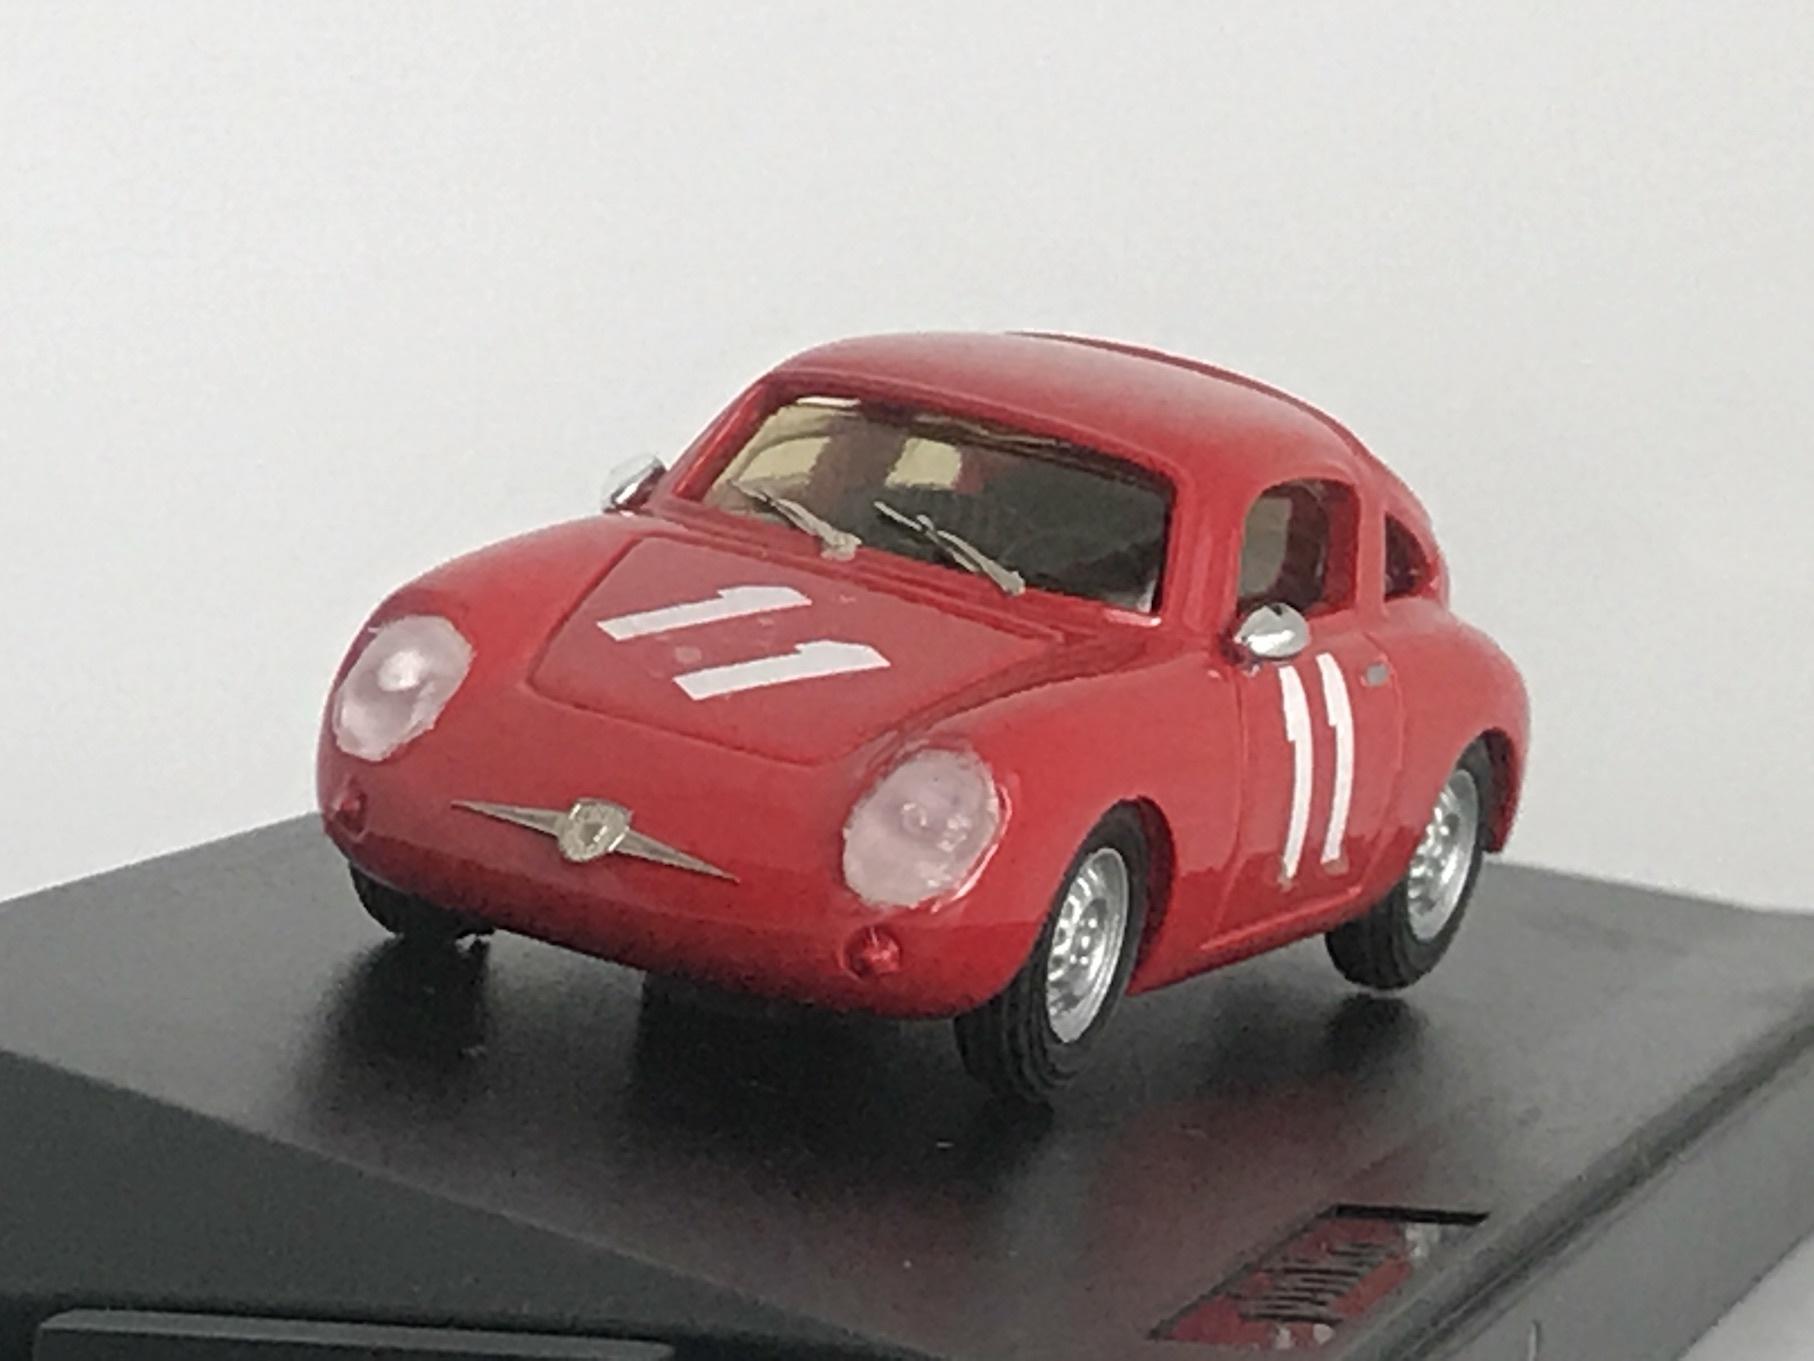 FIAT ABARTH 750 RECORDMONZA 1959 (1/43) 【PINKO】